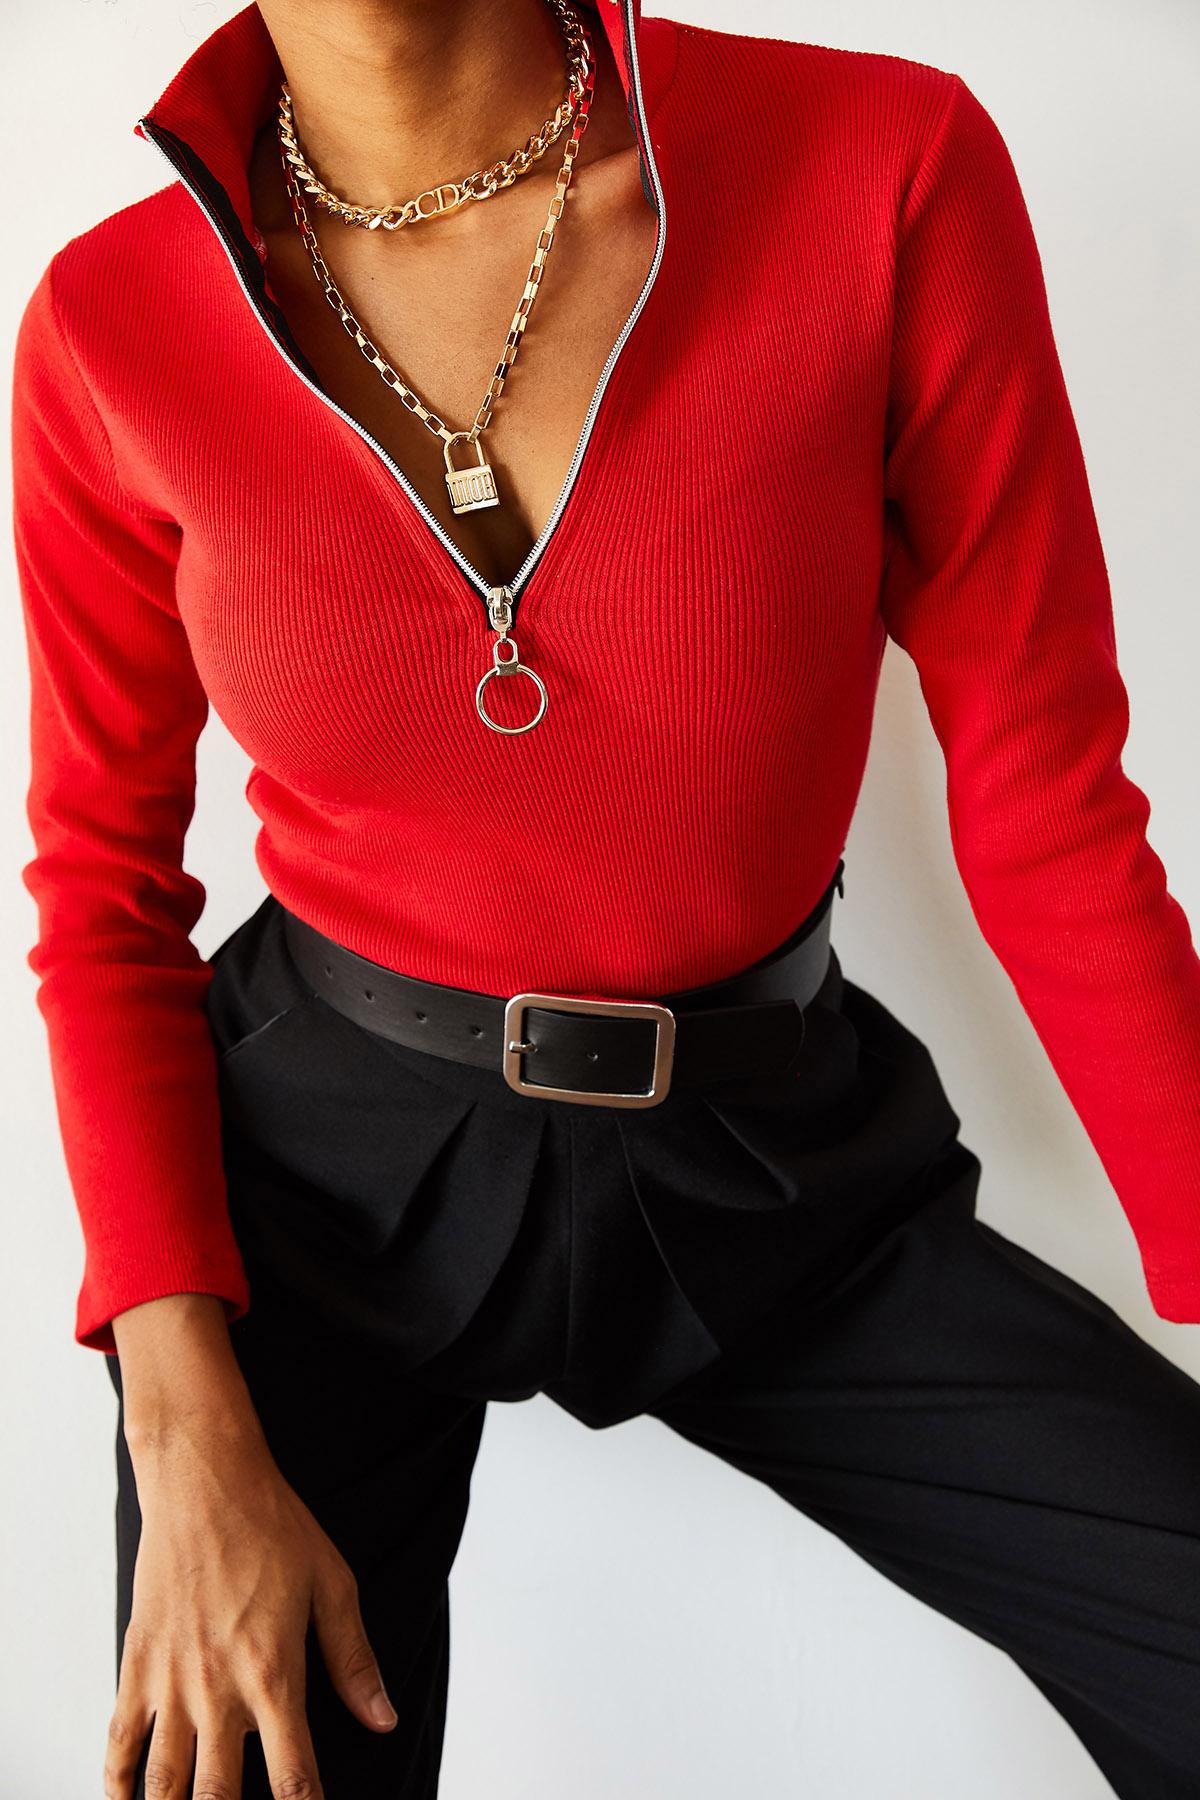 XHAN - Kırmızı Kaşkorse Fermuarlı Bluz 1KXK8-44690-04